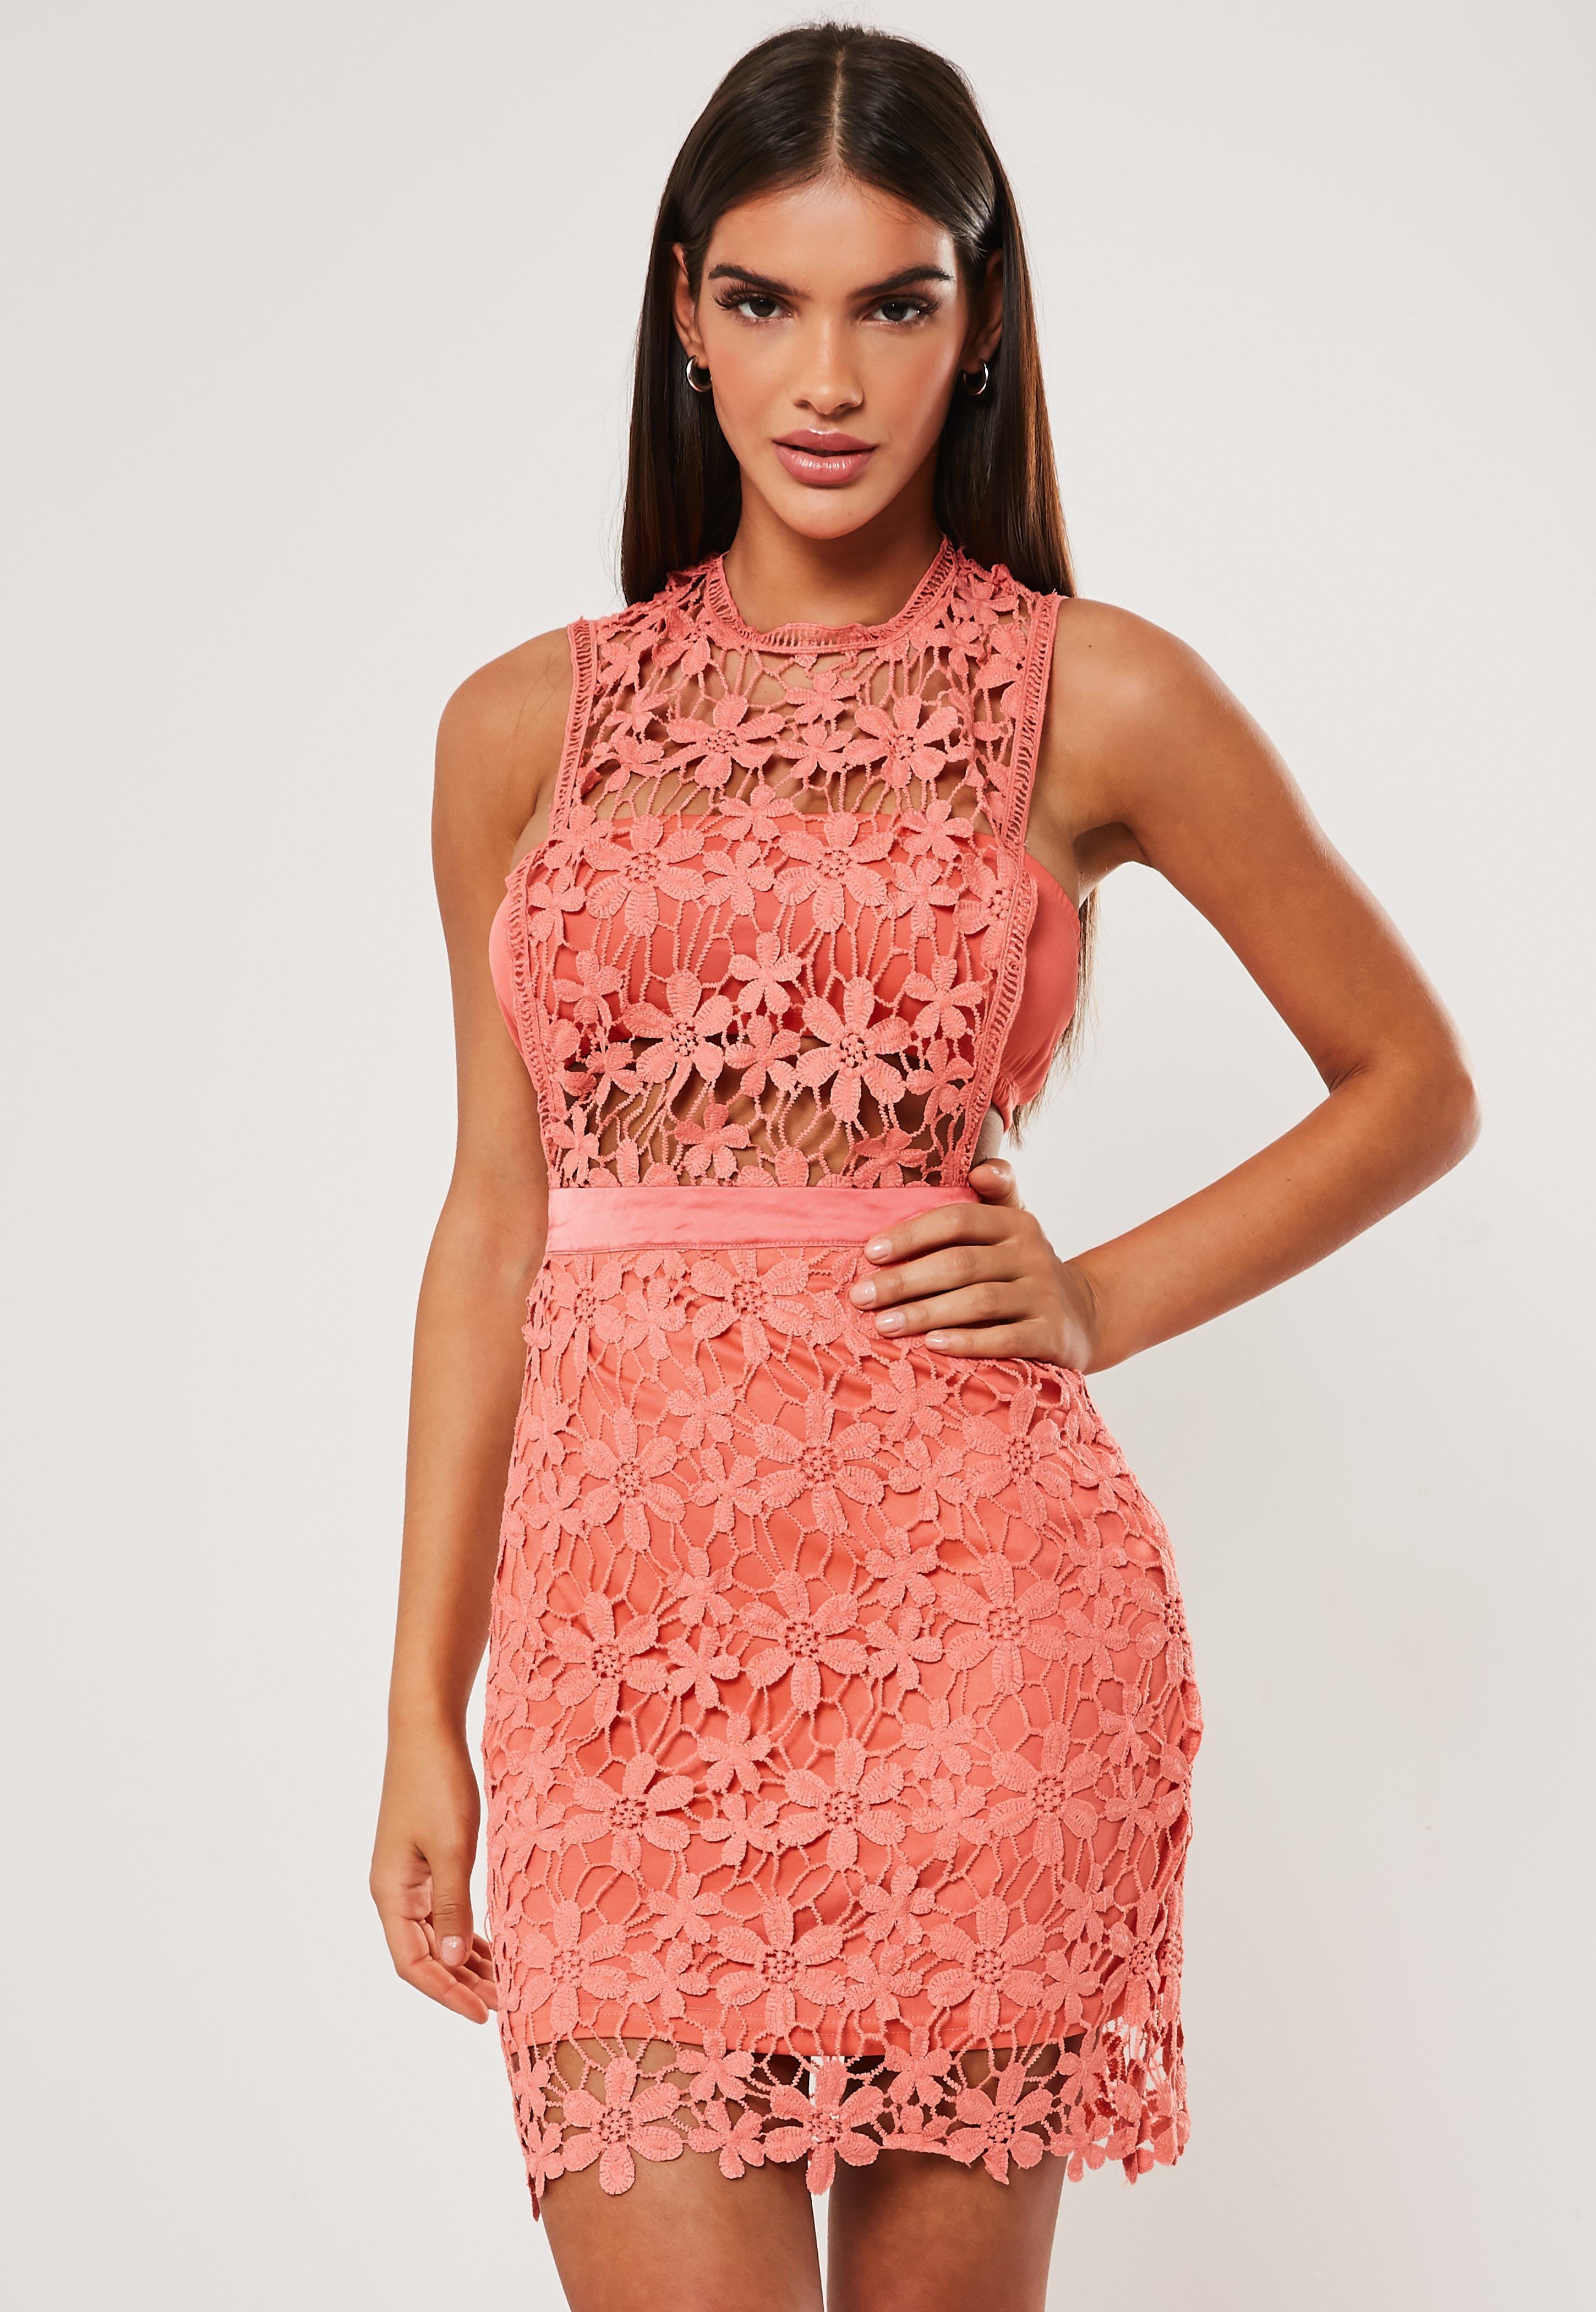 27684b2bb021a Coral Daisy Lace Sheer Insert Mini Dress